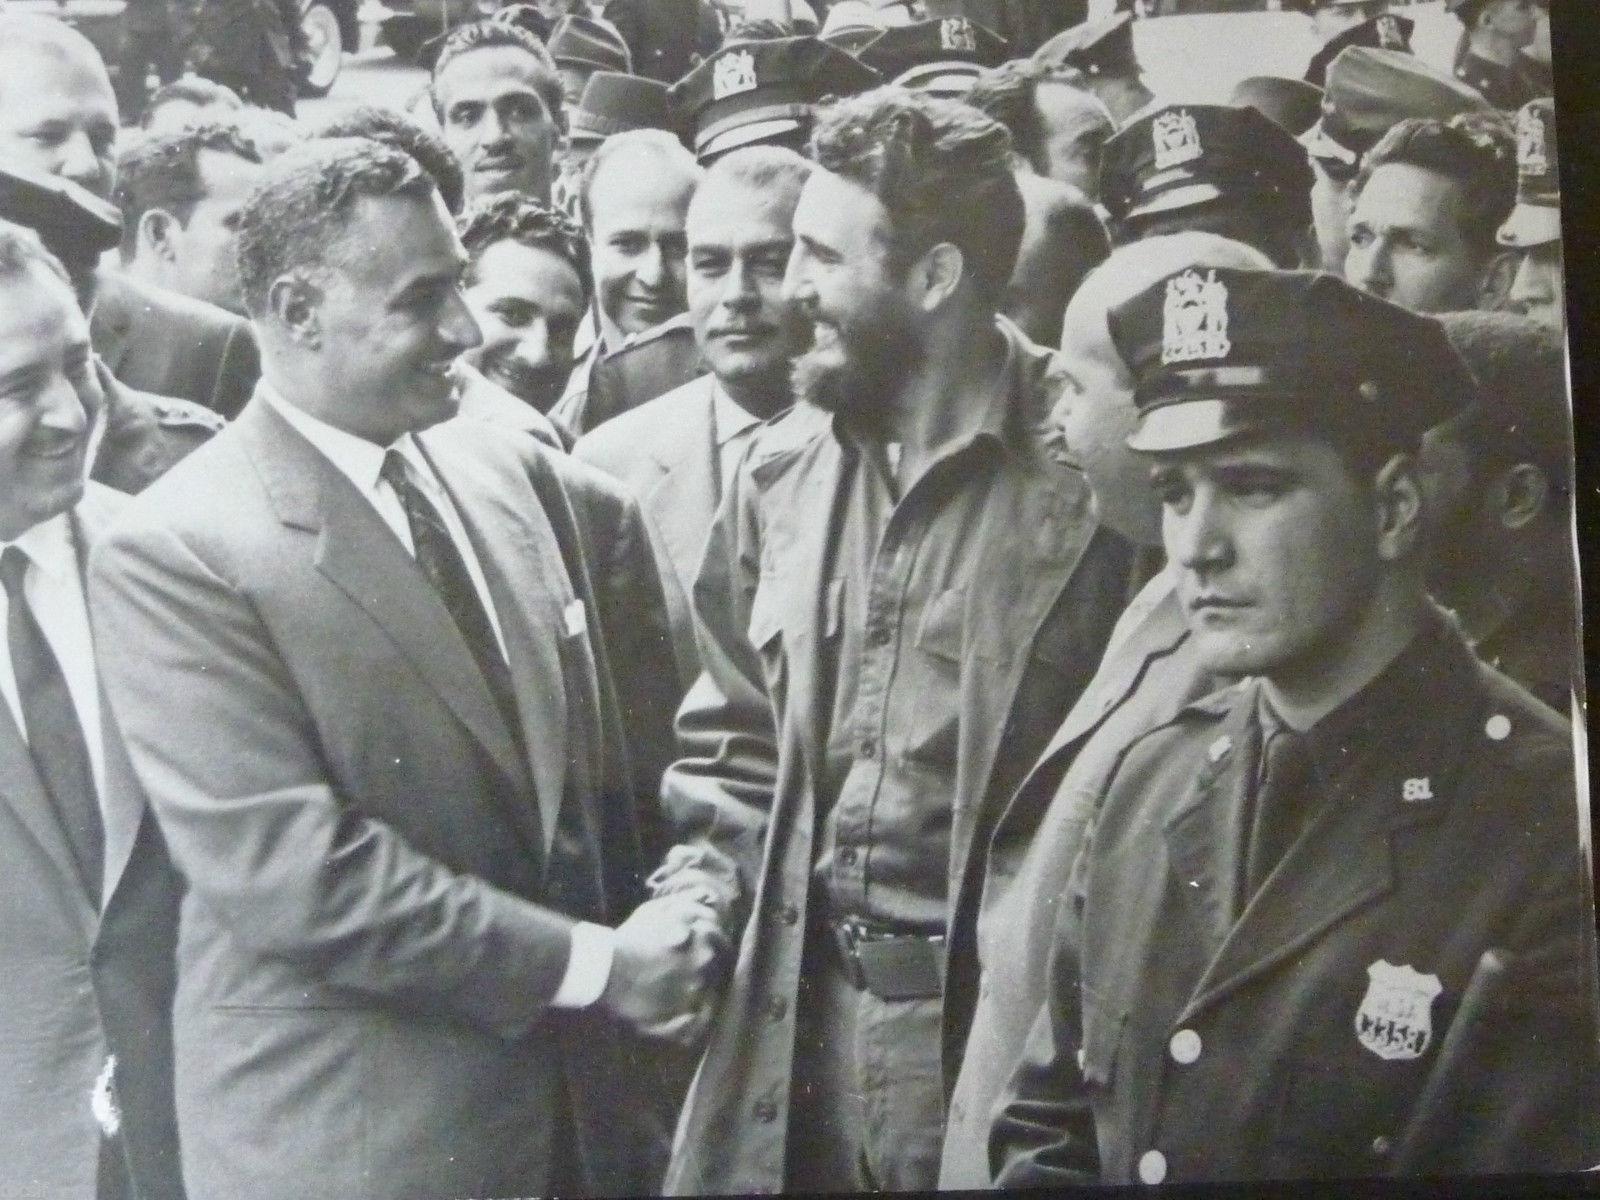 Fidel Castro and Gamal Abdul Nasser in 1960.